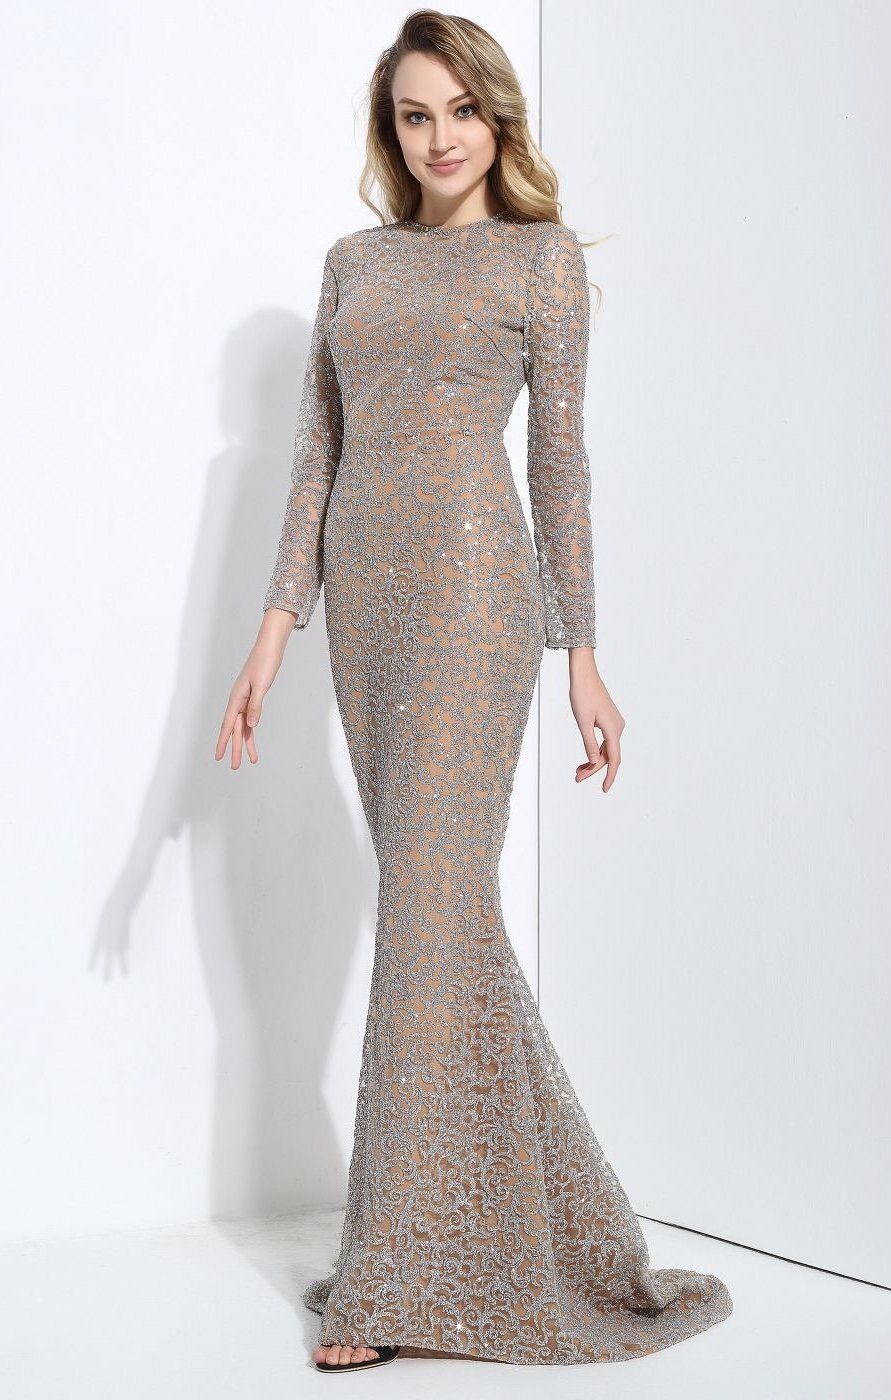 Allure silver glitter embellished long sleeve fishtail maxi dress